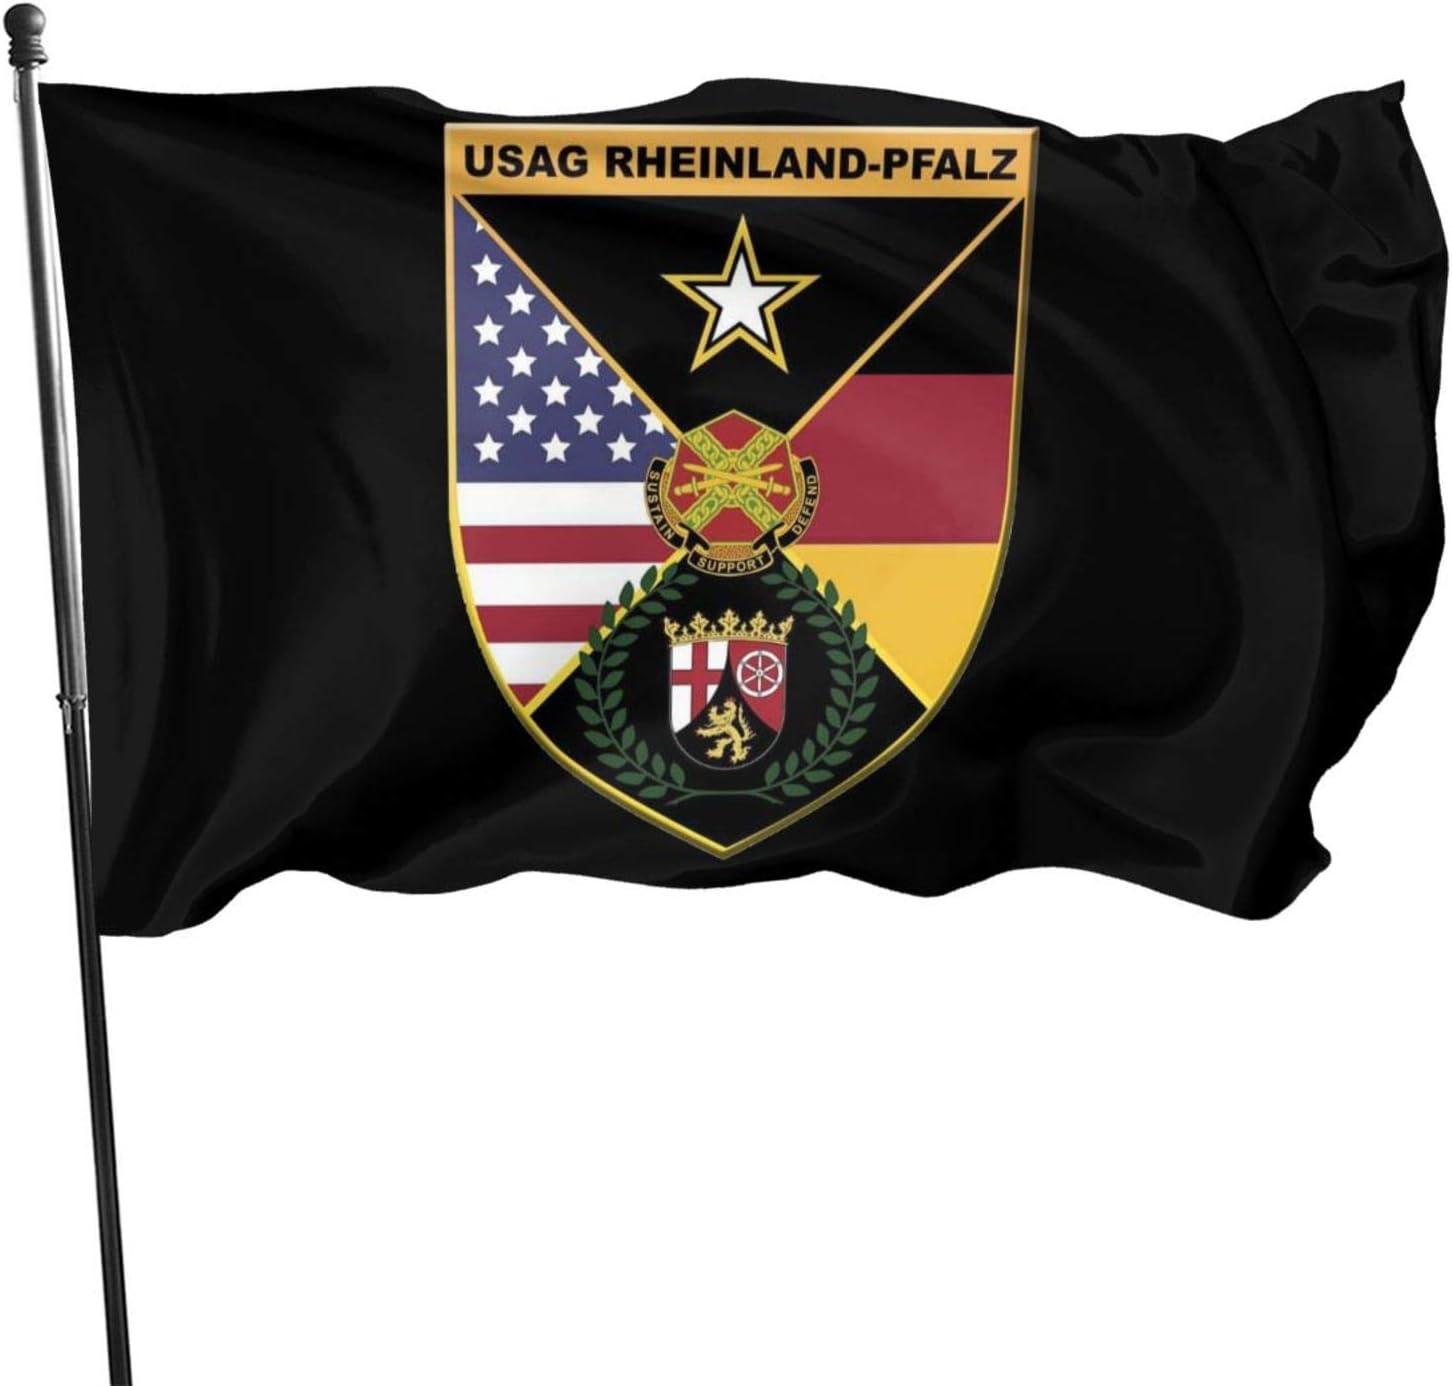 U.S. Army Garrison Rheinland-Pfalz Outdoor Garden Flag Indoor Flag Home Decor Standing Farm Flag Banner 3x5ft